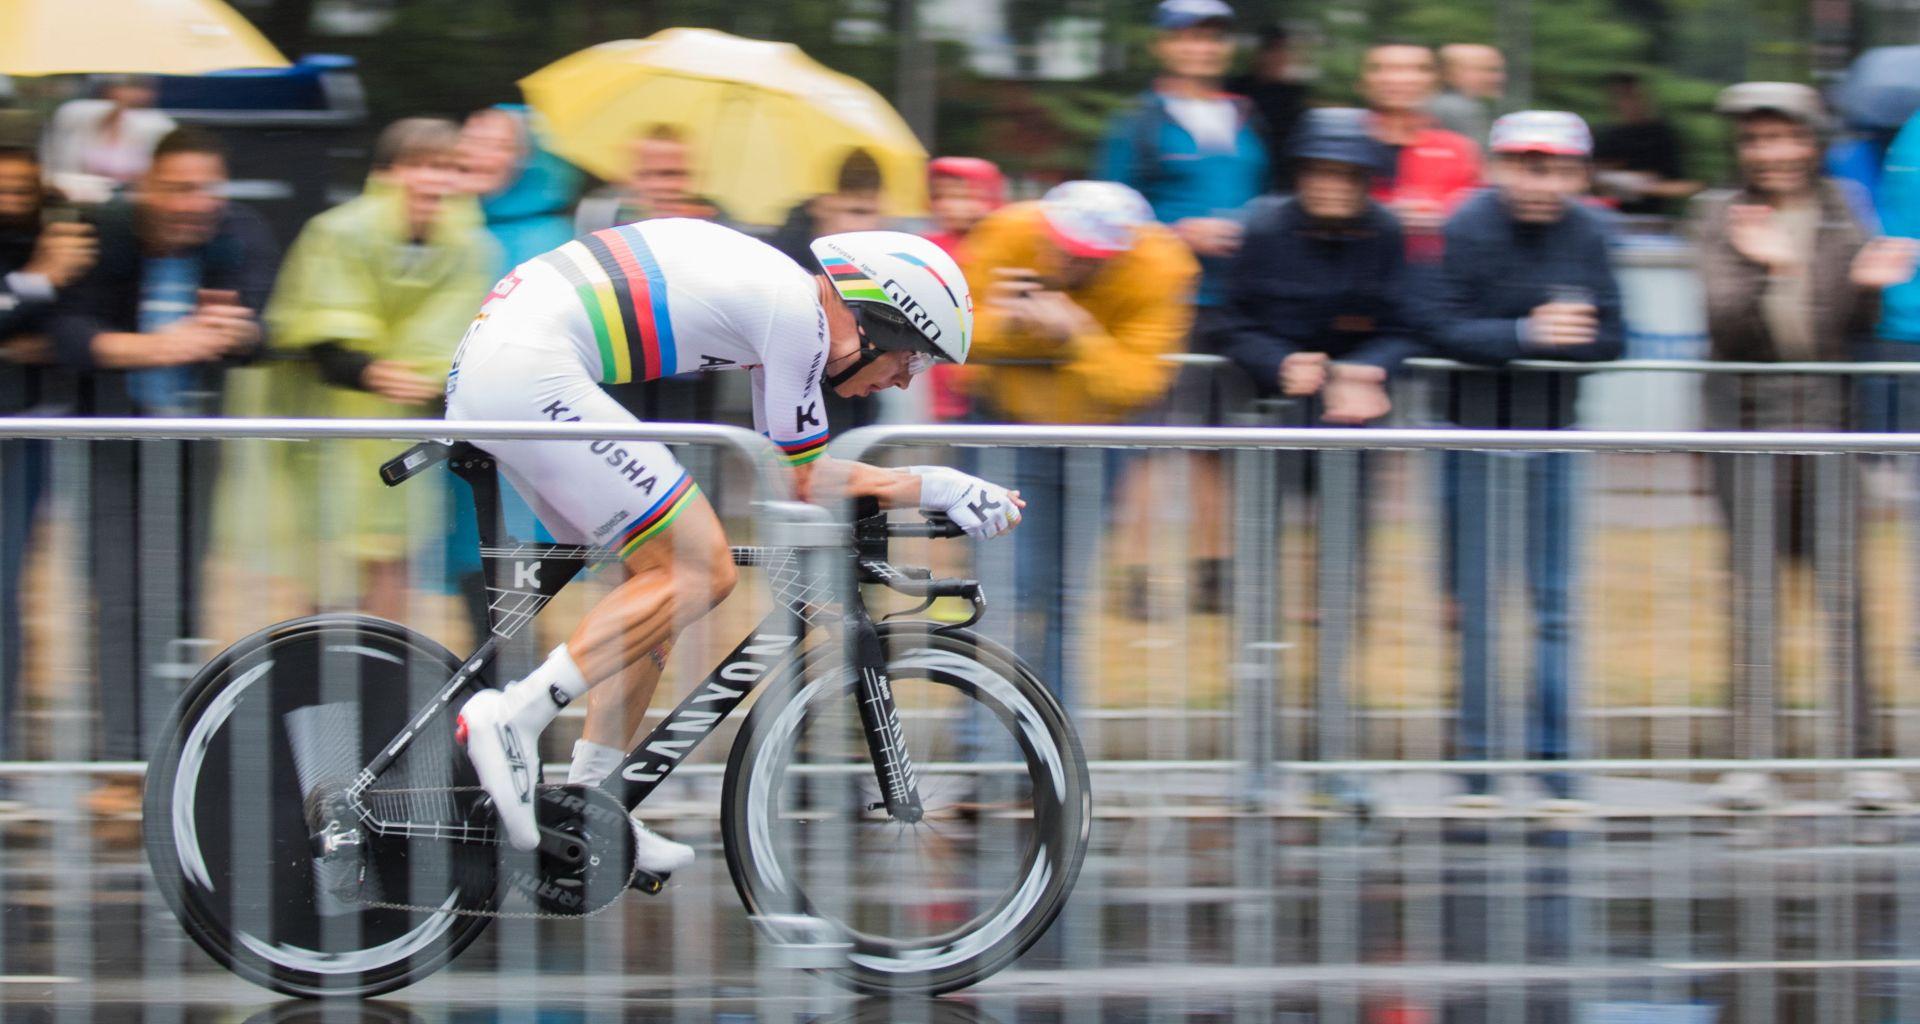 TOUR DE FRANCE Thomas i momčad Skya briljirali u prvoj etapi